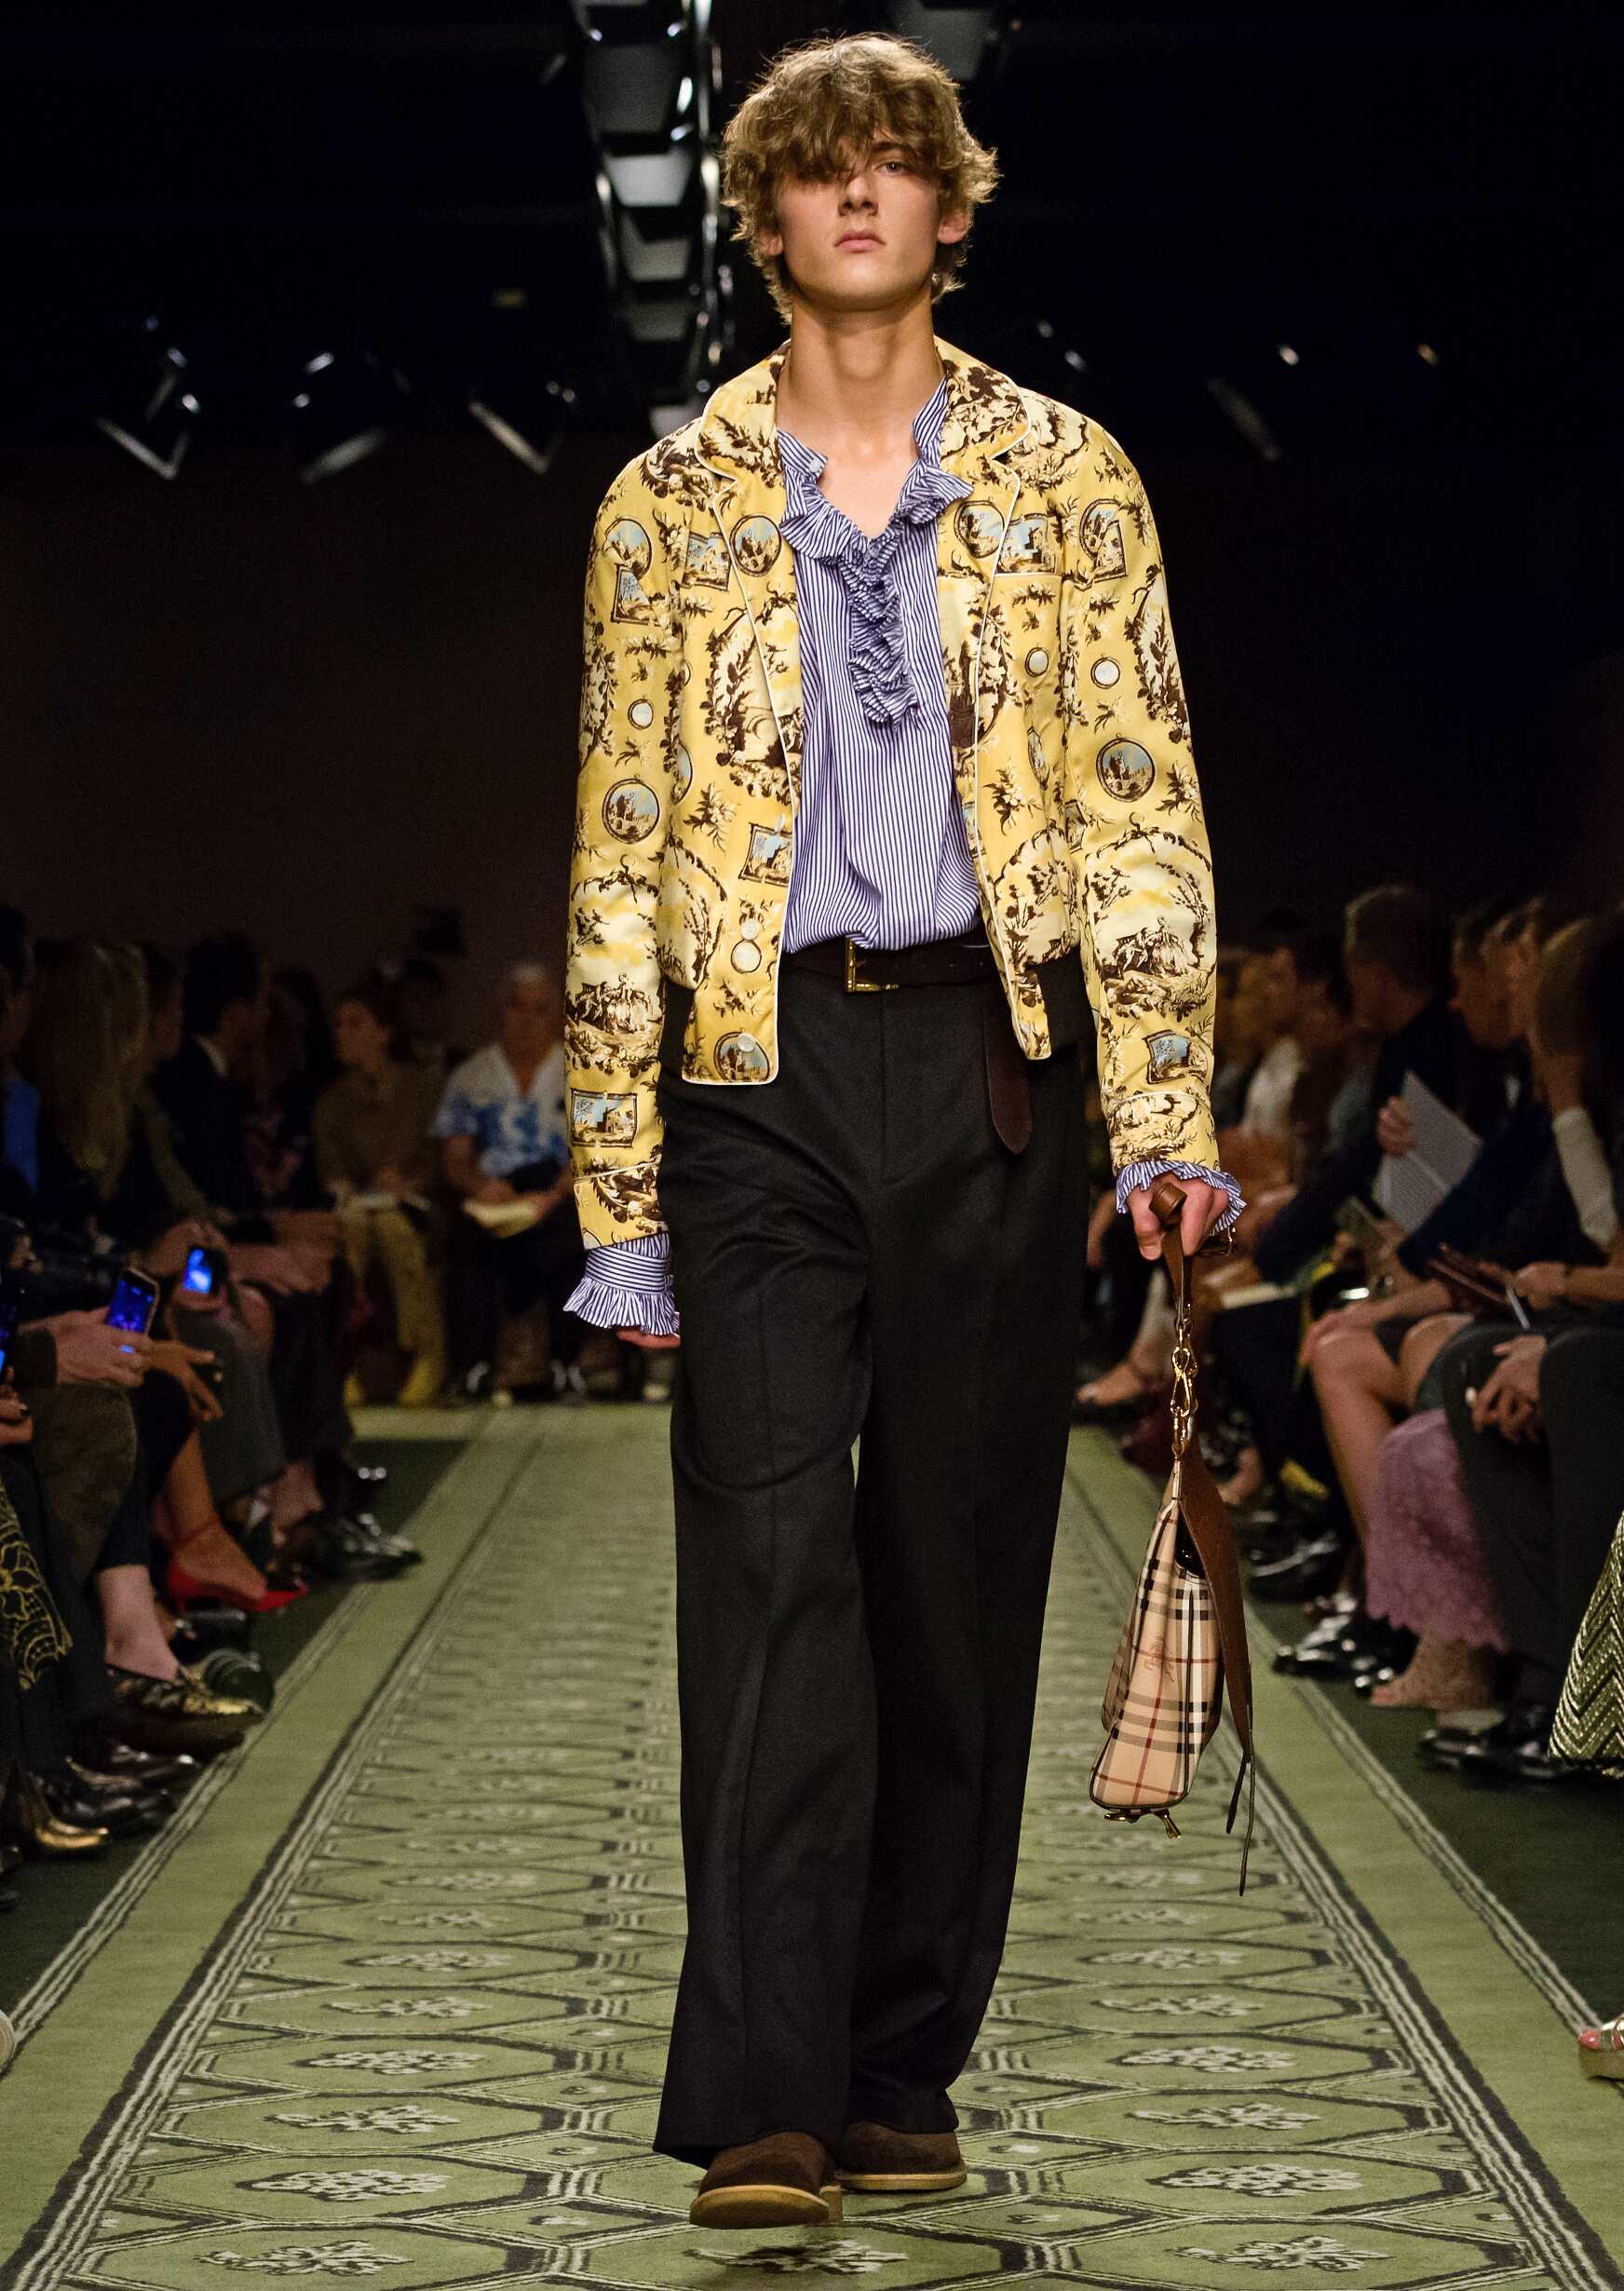 Fashion Man Model Burberry Catwalk London Fashion Week